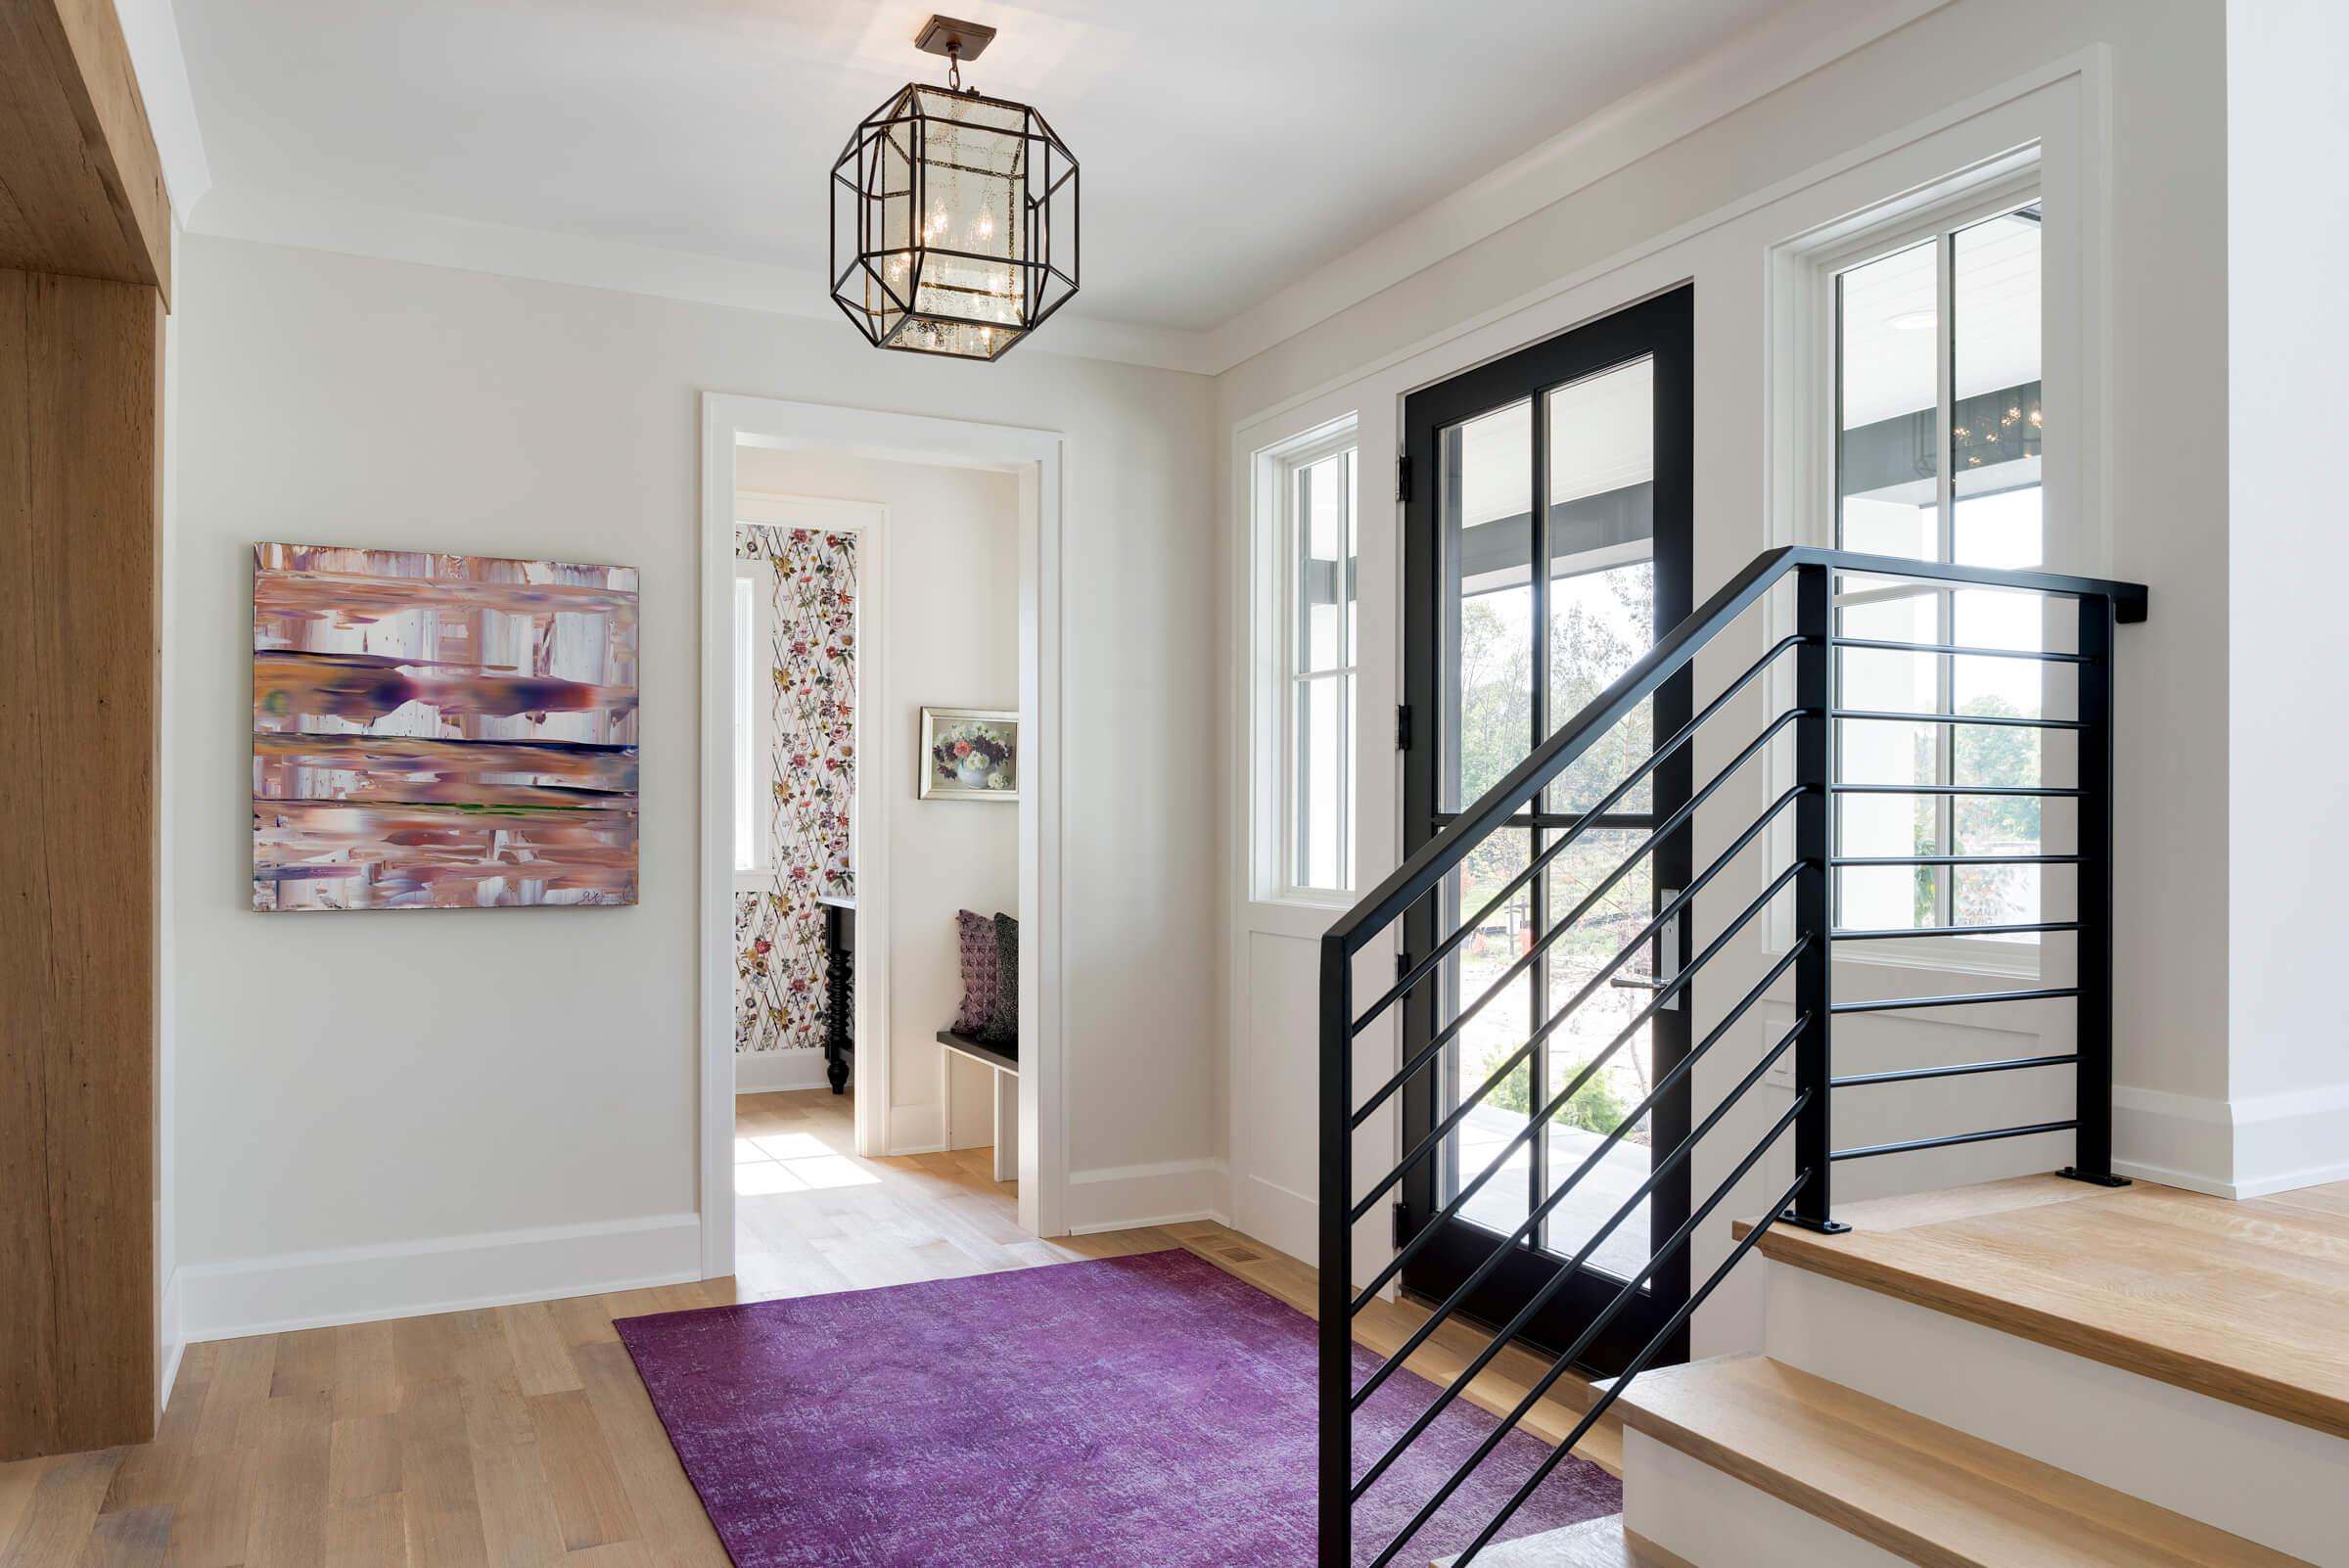 https://cityhomesllc.com/properties/6505-hawks-pointe-lane-victoria-mn